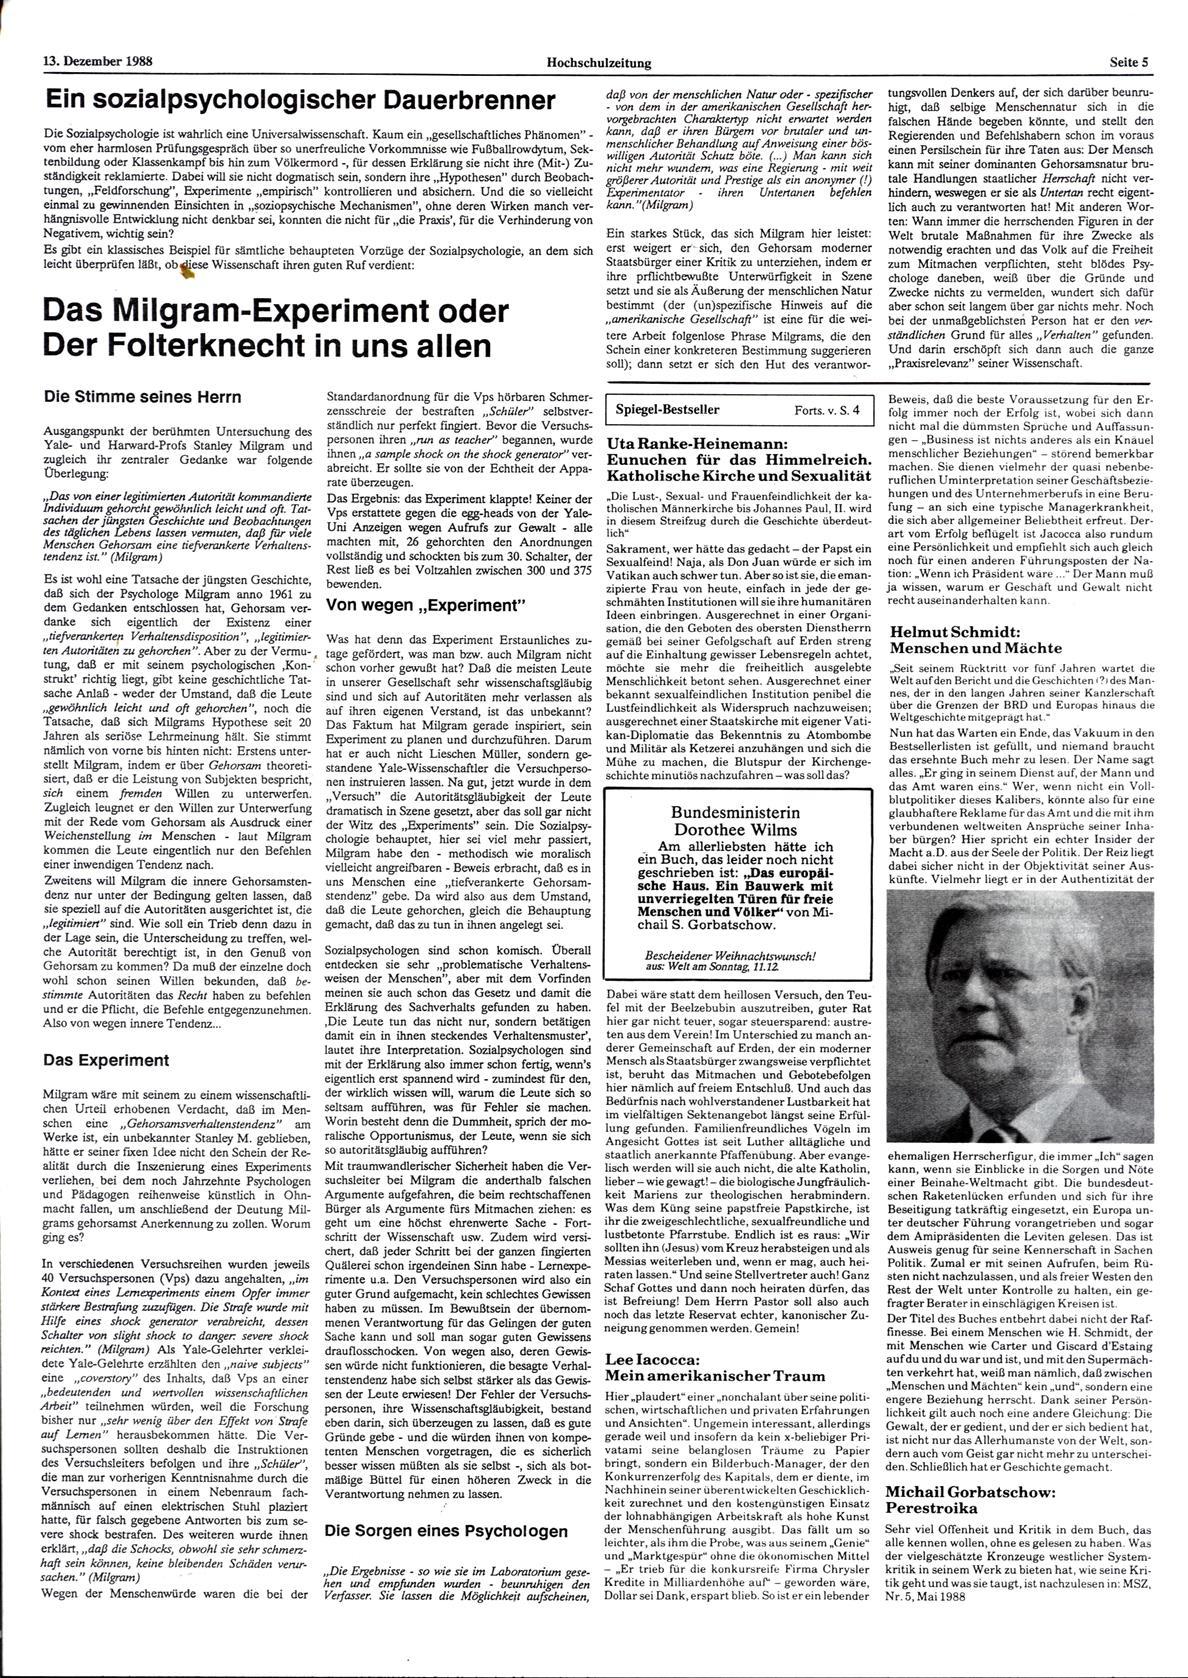 Bochum_BHZ_19881213_183_005